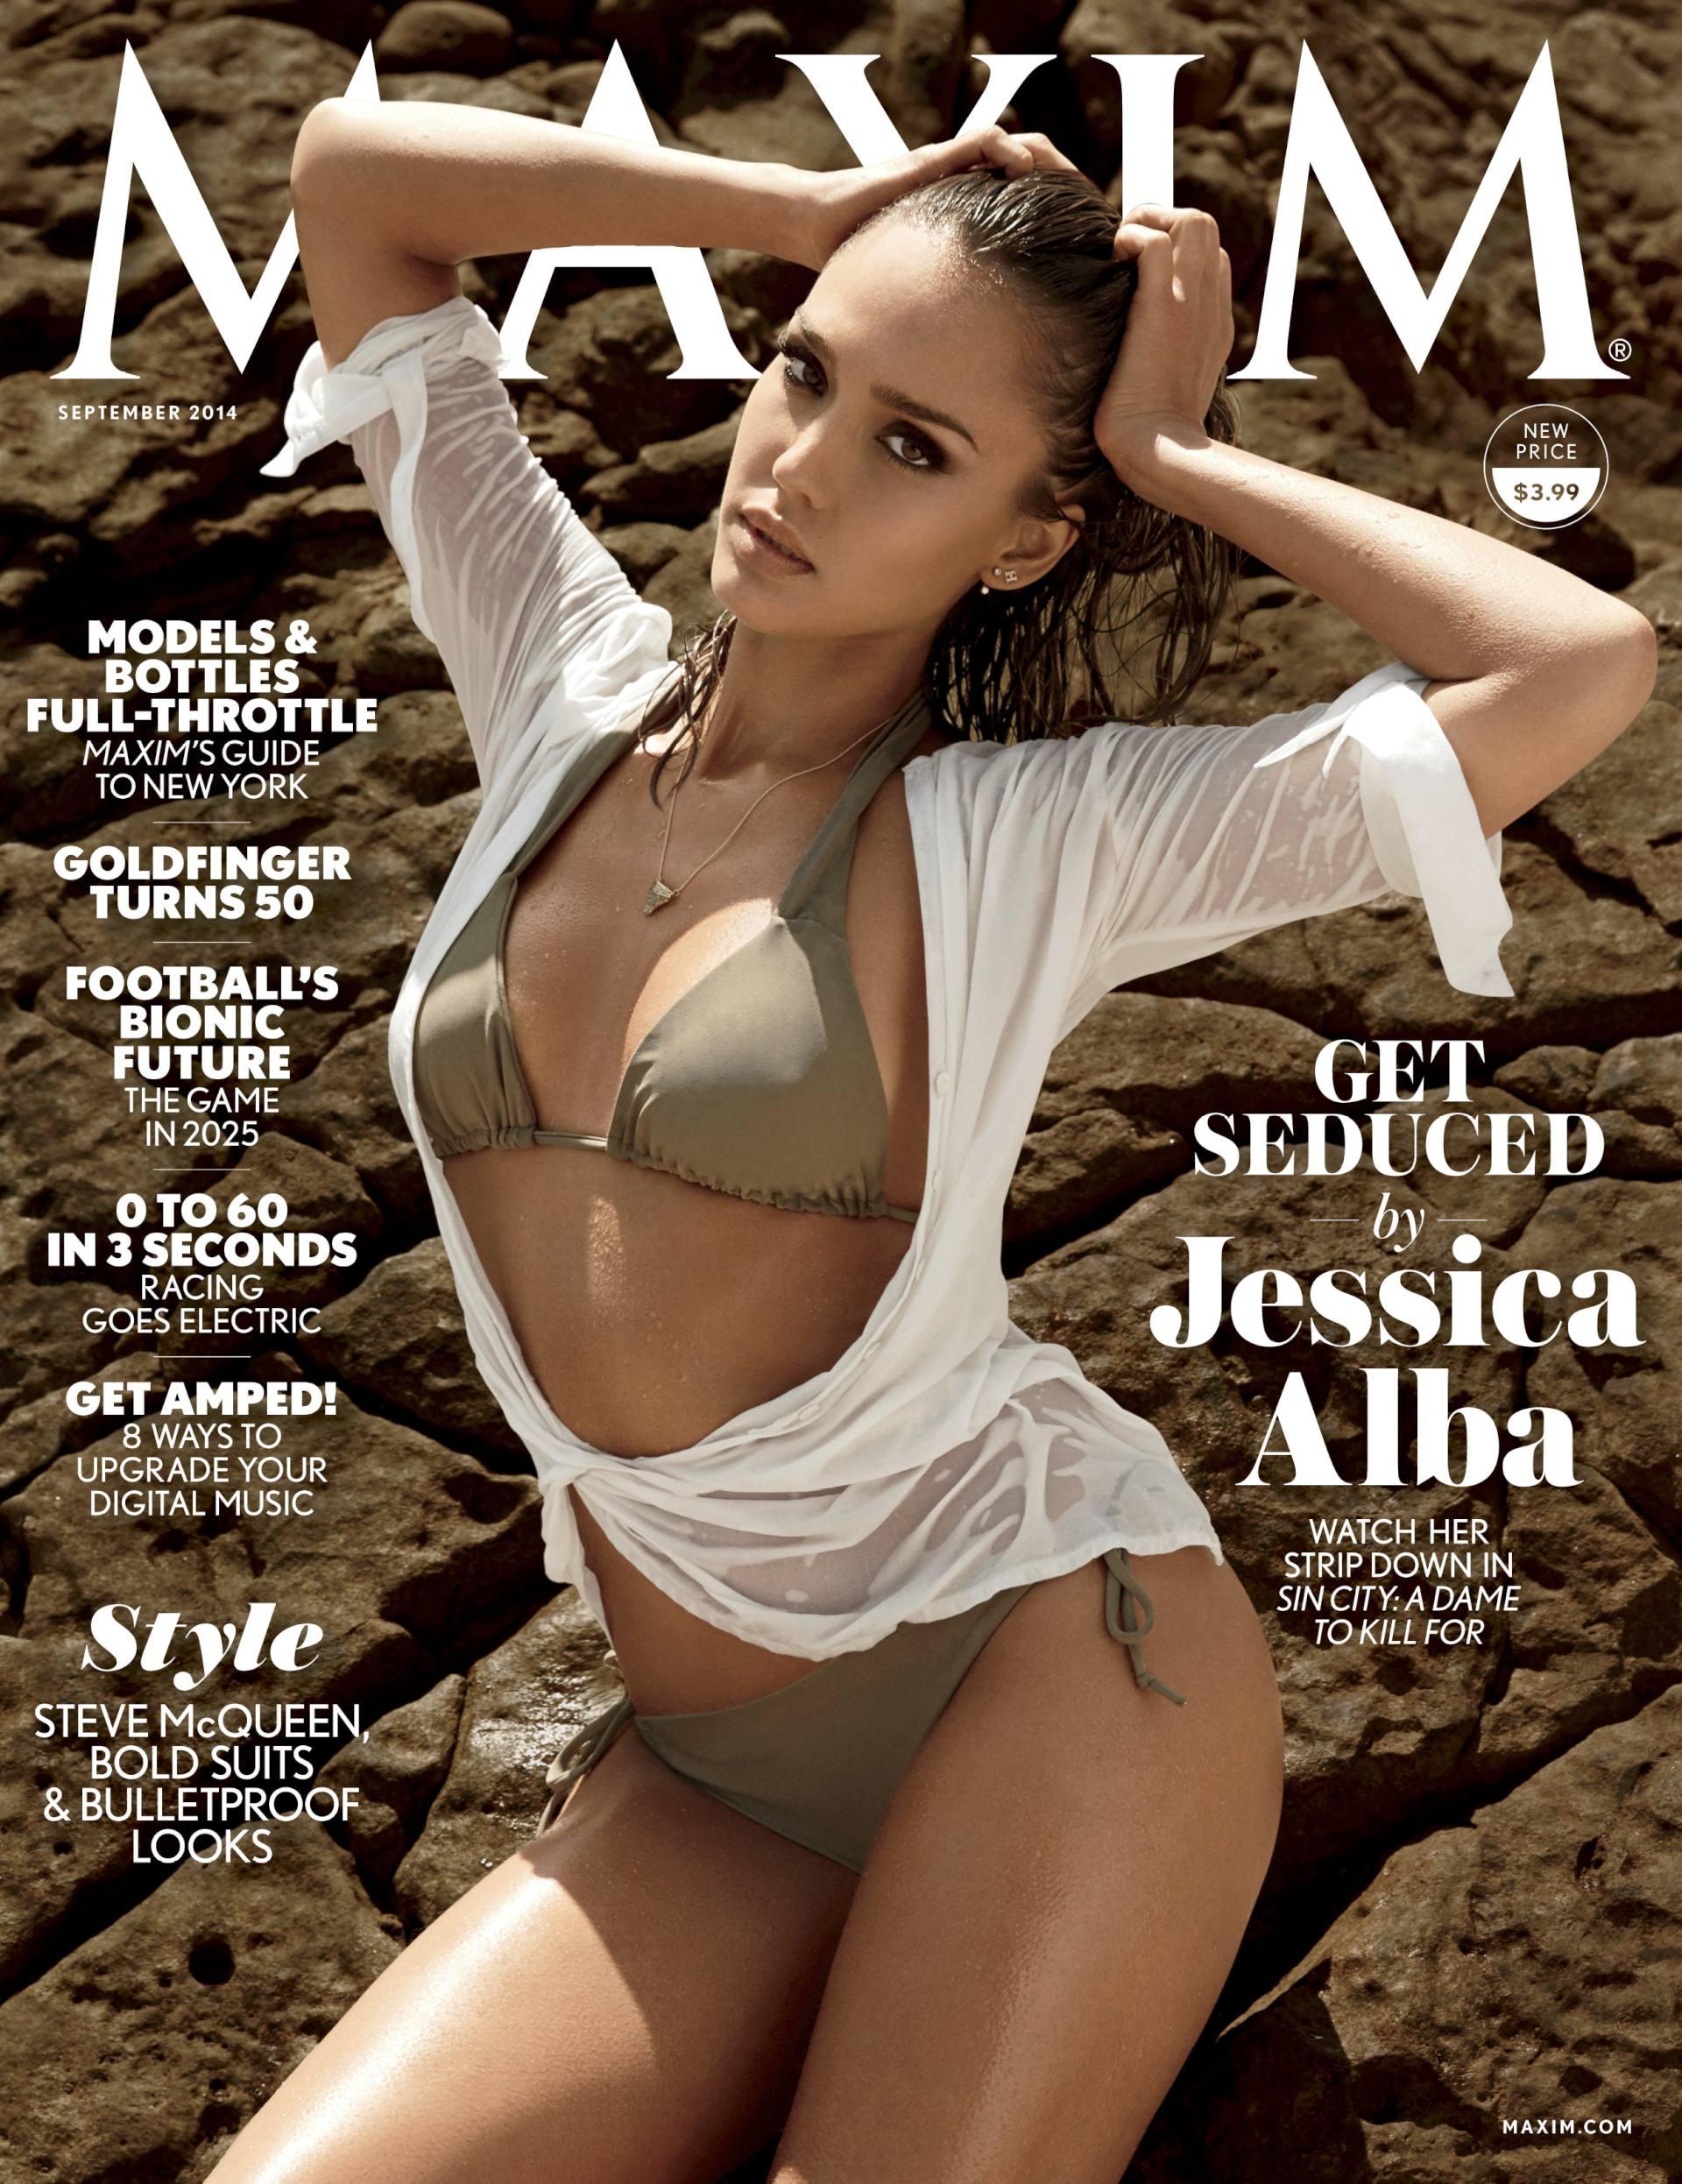 Jessica Alba – Beautiful Body In Sexy Photoshoot For Maxim Magazine (september 2014) (hq) 0005